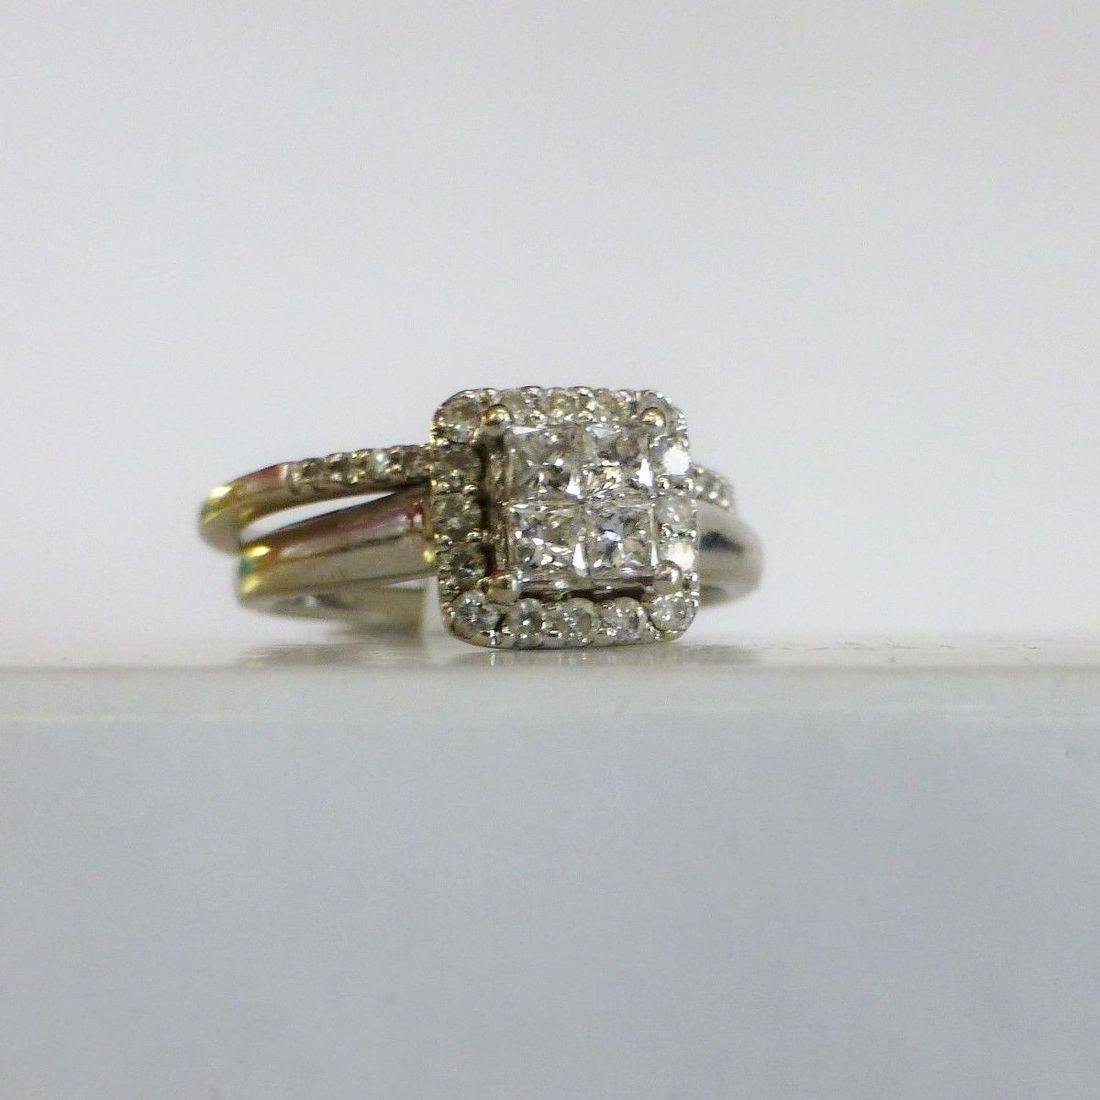 White Gold Wedding Set With A Diamond Halo Princess Cut Quad Center Engagement Ring and A Round Prong Set Diamond Wedding Band